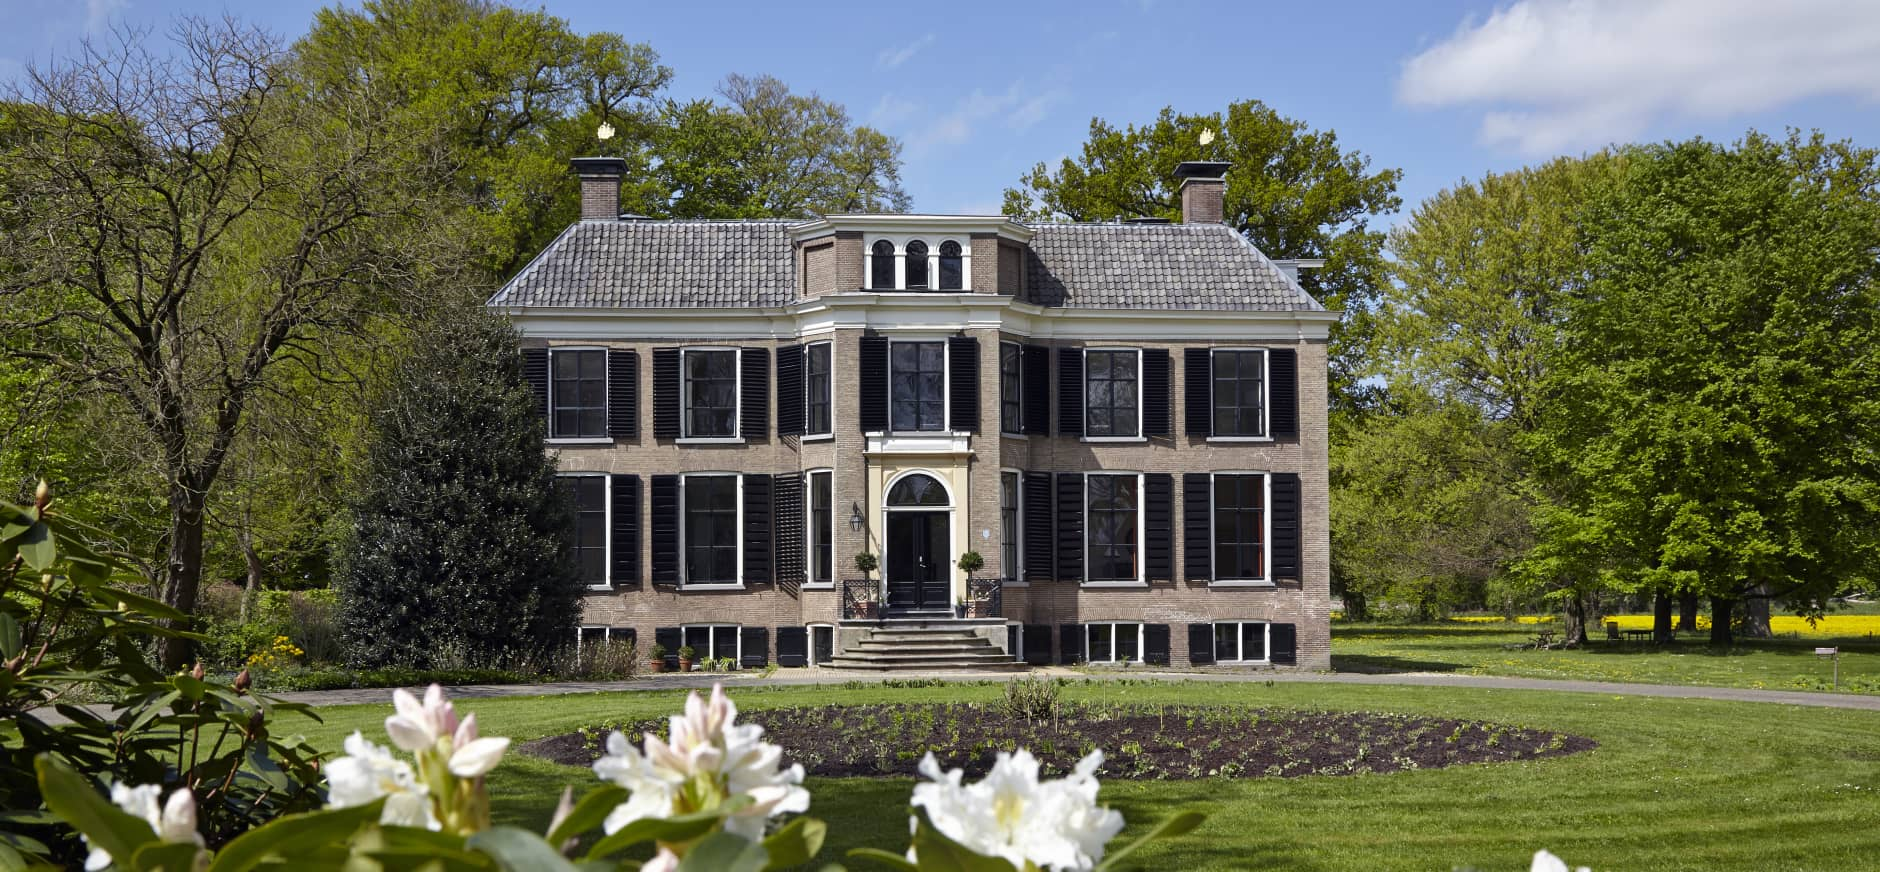 Landhuis De Velhorst